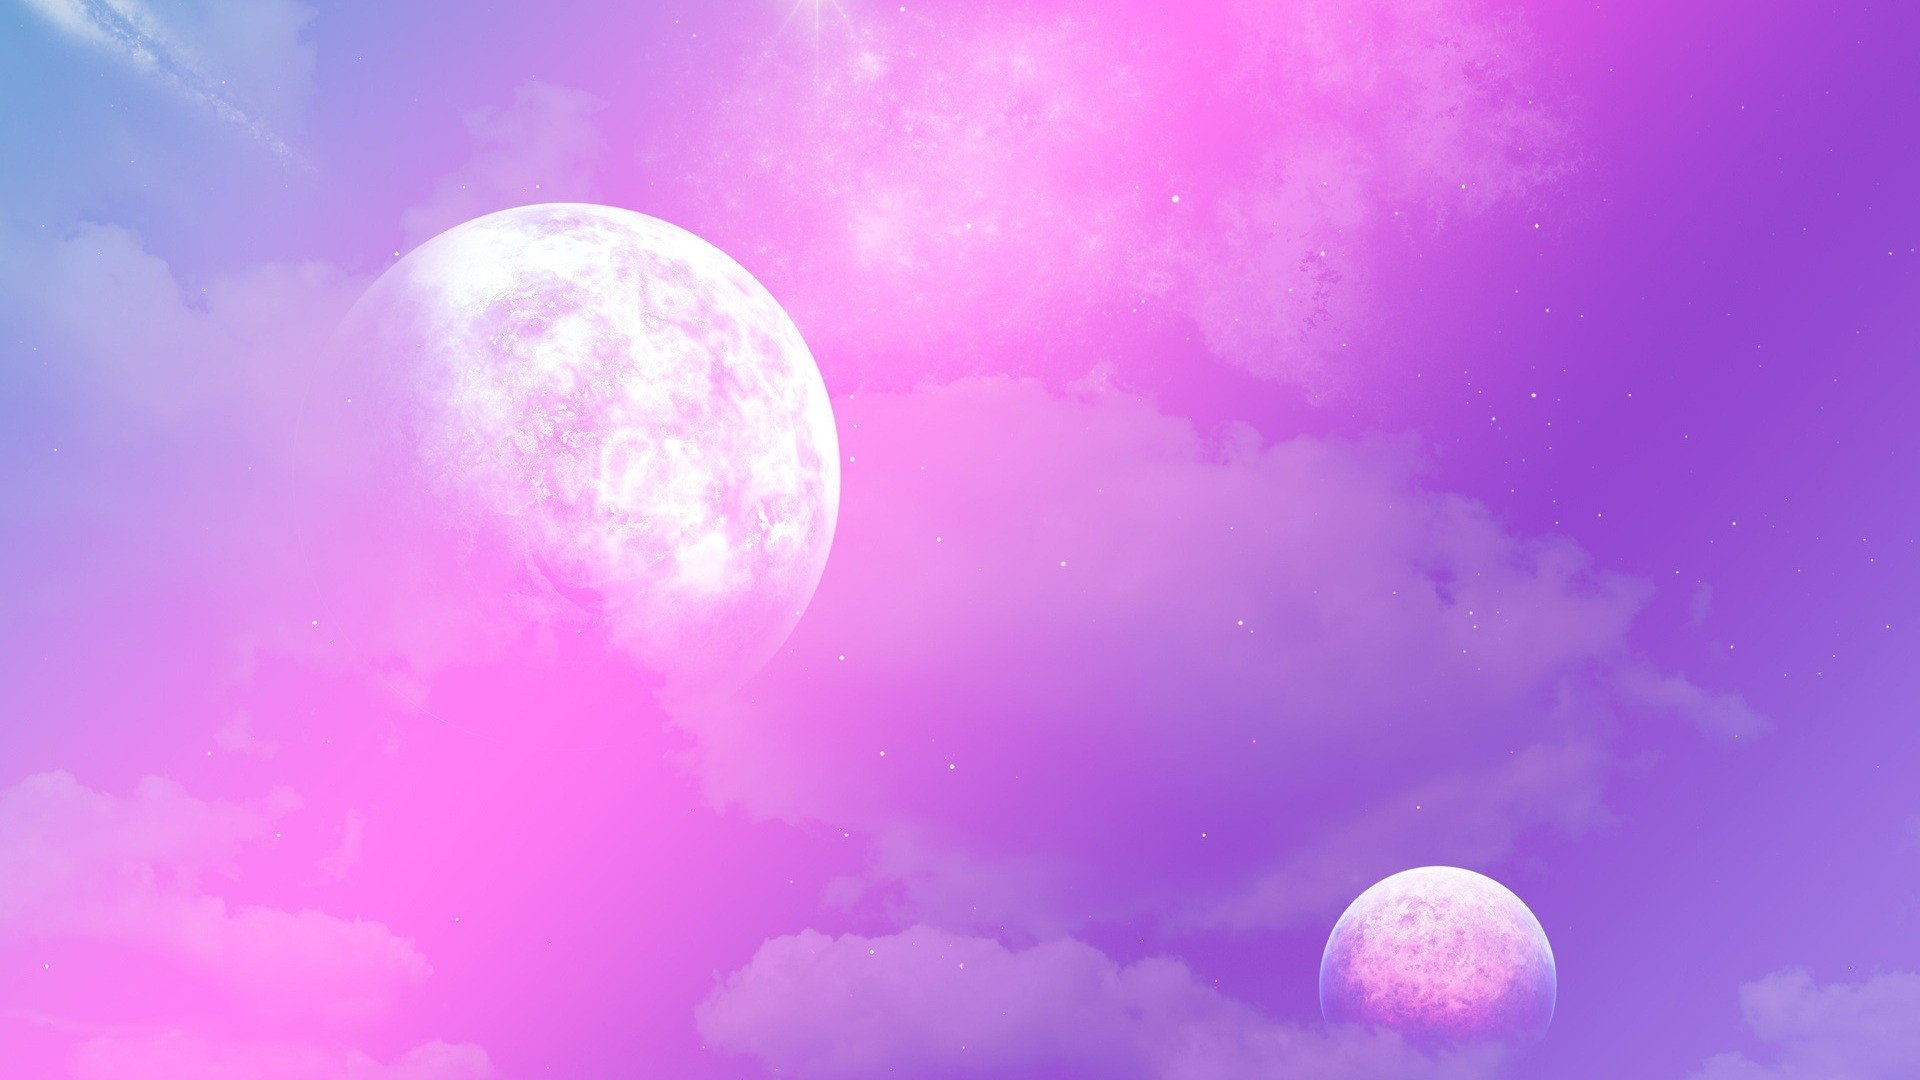 Moon Hd Wallpaper Background Image 1920x1080 Id 261205